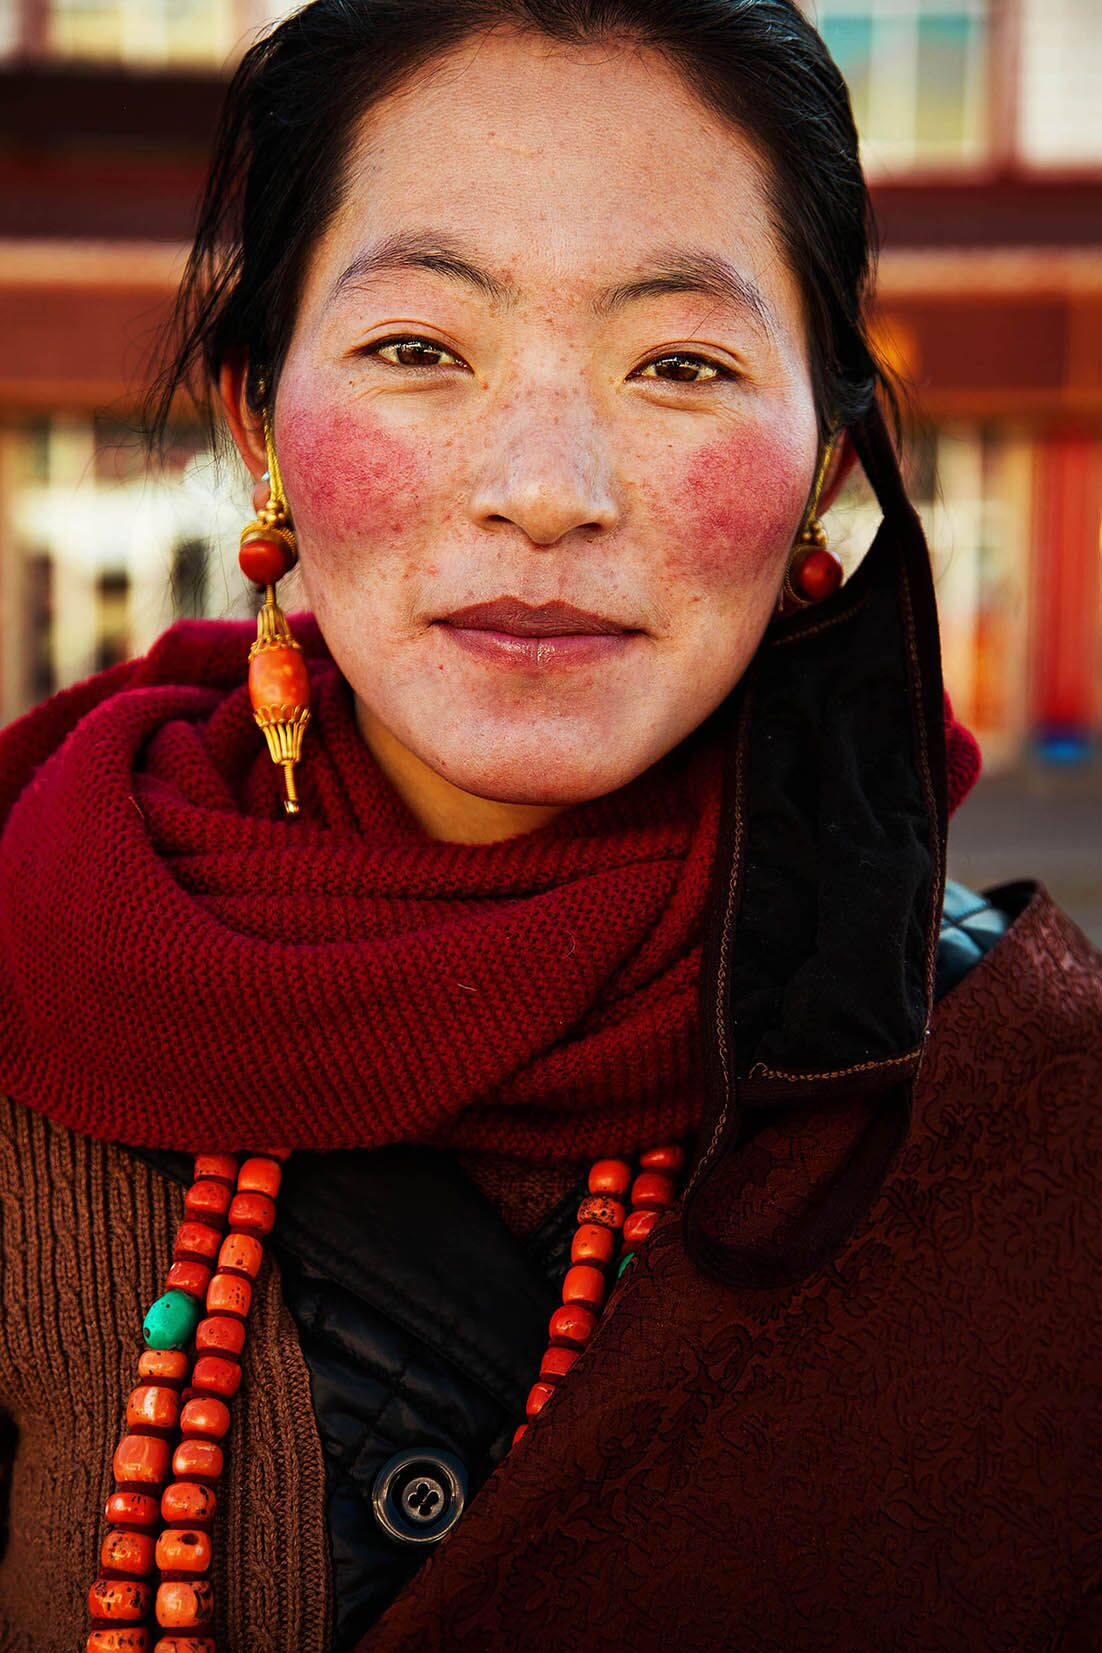 Tibetan Plateau, China2